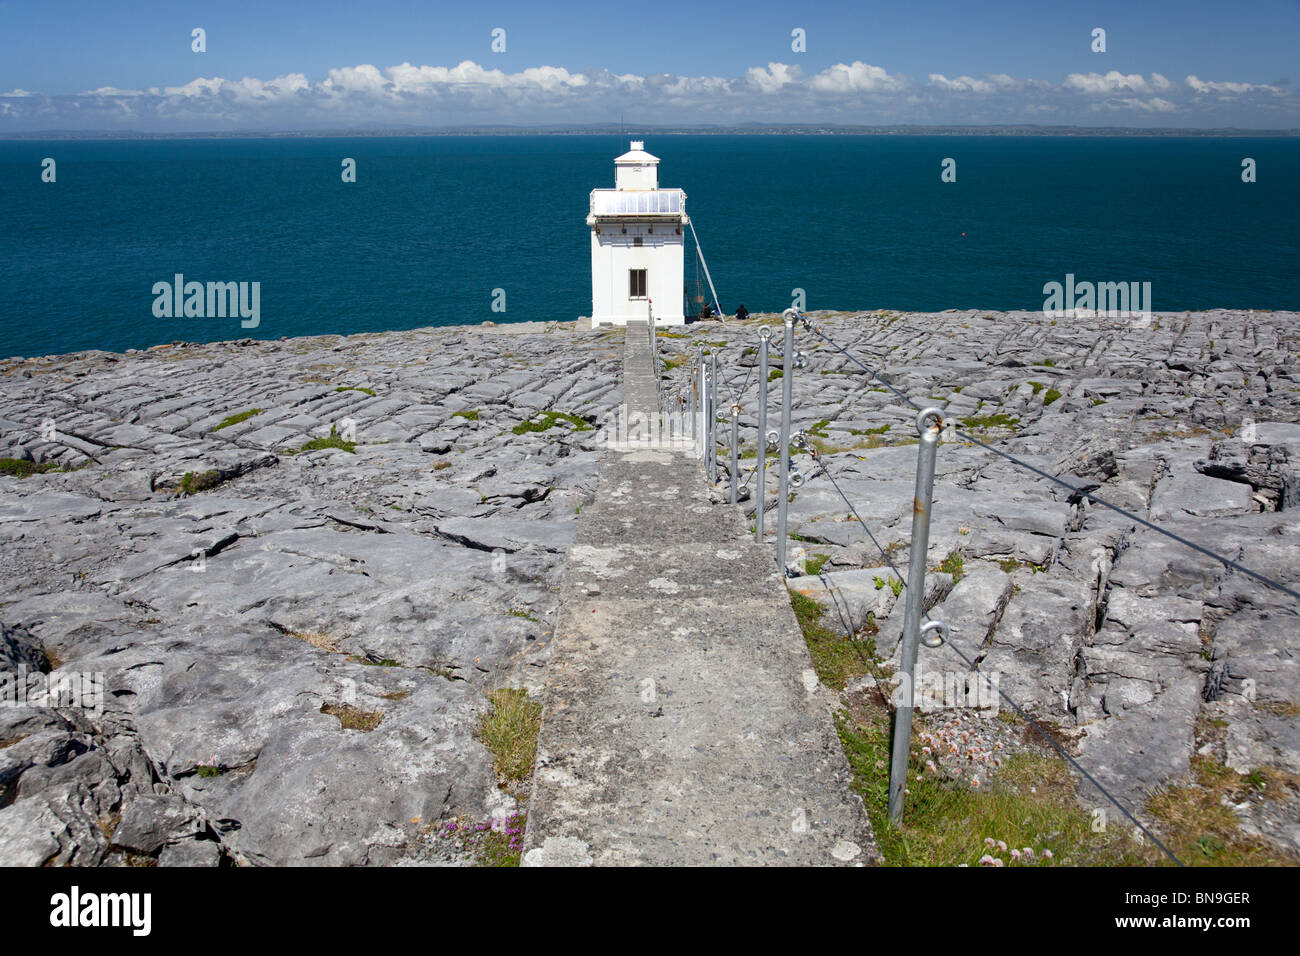 black-head-lighthouse-overlooking-galway-bay-co-clare-ireland-BN9GER.jpg